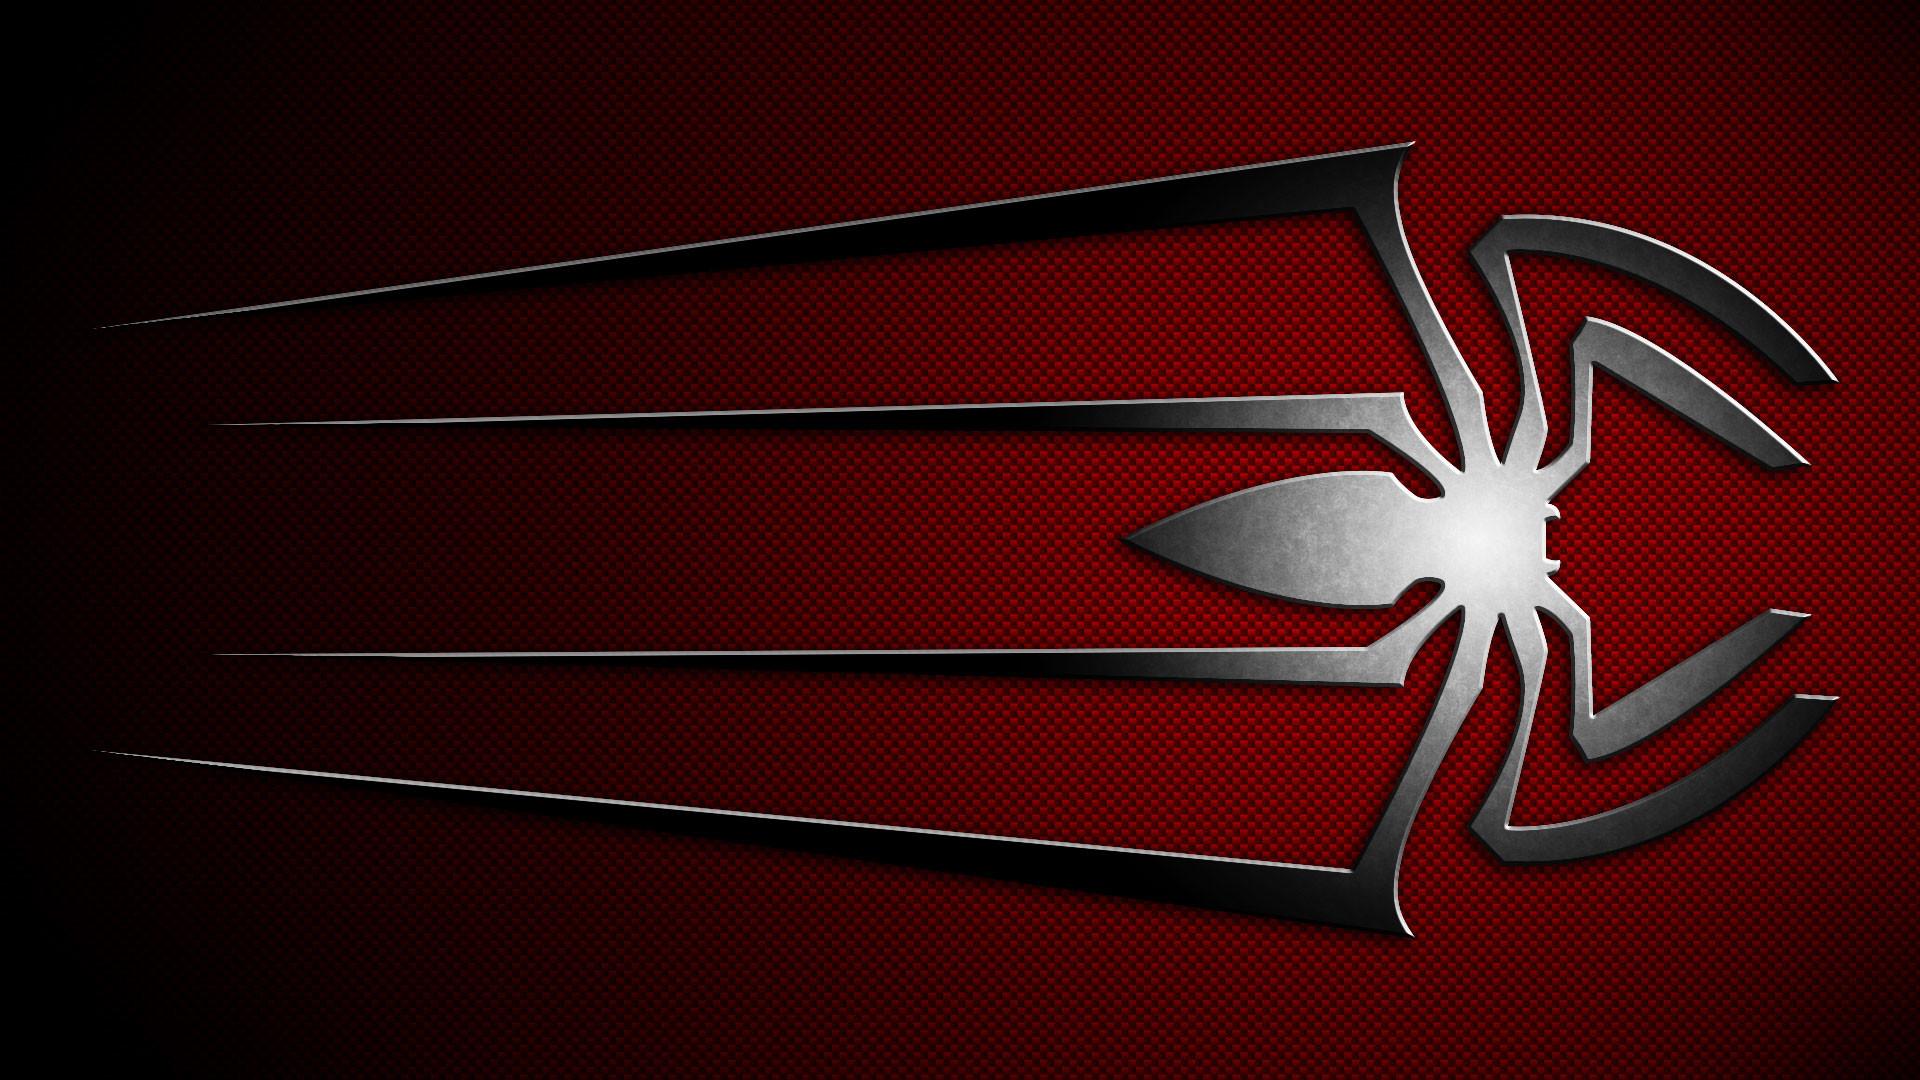 hd pics photos amazing spiderman best logo spider hollywood hd quality  desktop background wallpaper